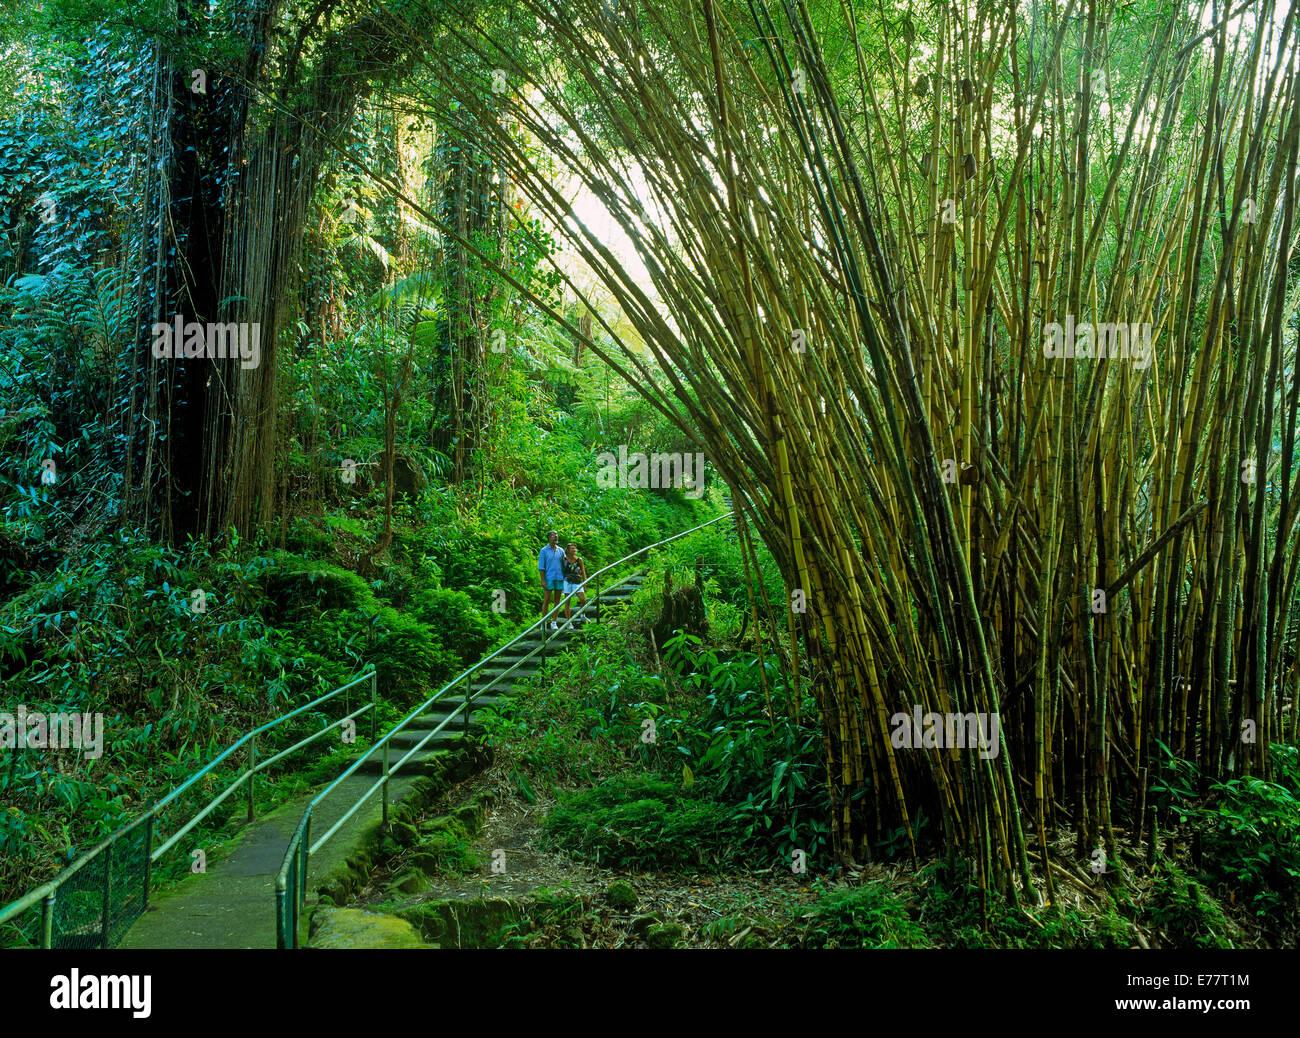 Couple on staircase walkway in bamboo forest below Akaka Falls on Big Island of Hawaii - Stock Image